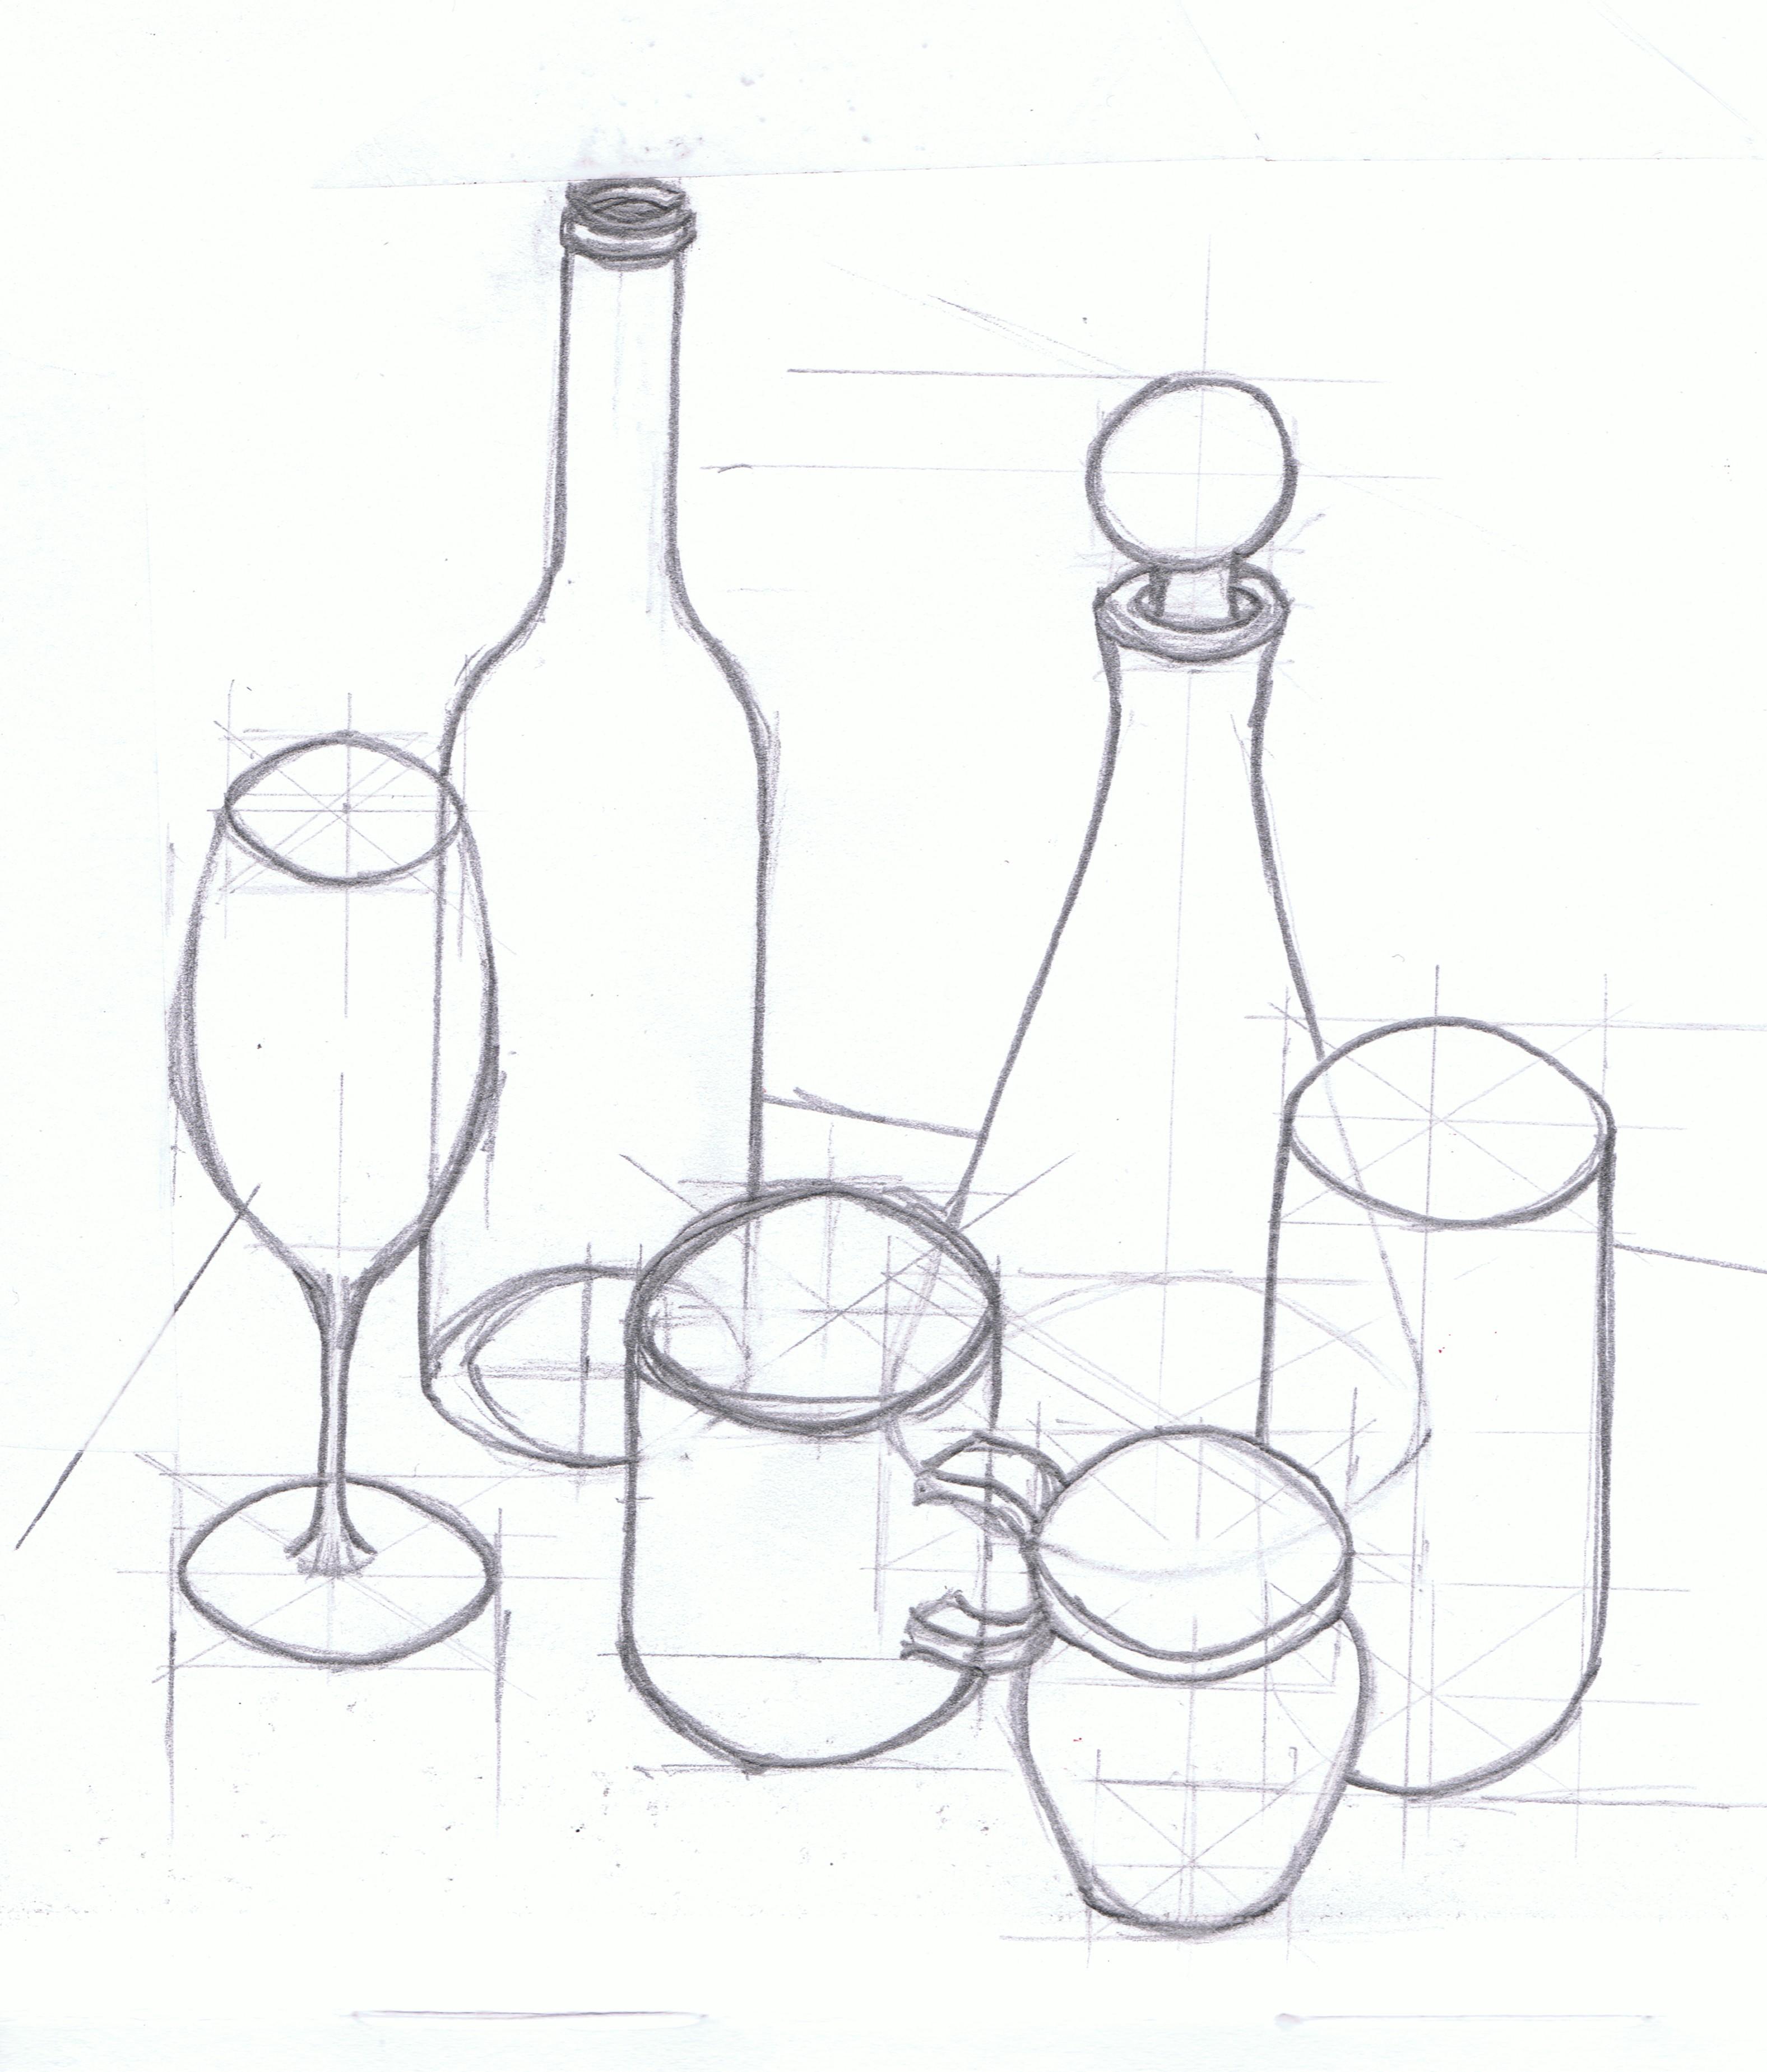 3153x3698 Anitabowmanoca Drawing 1 My Oca Learning Log Page 12